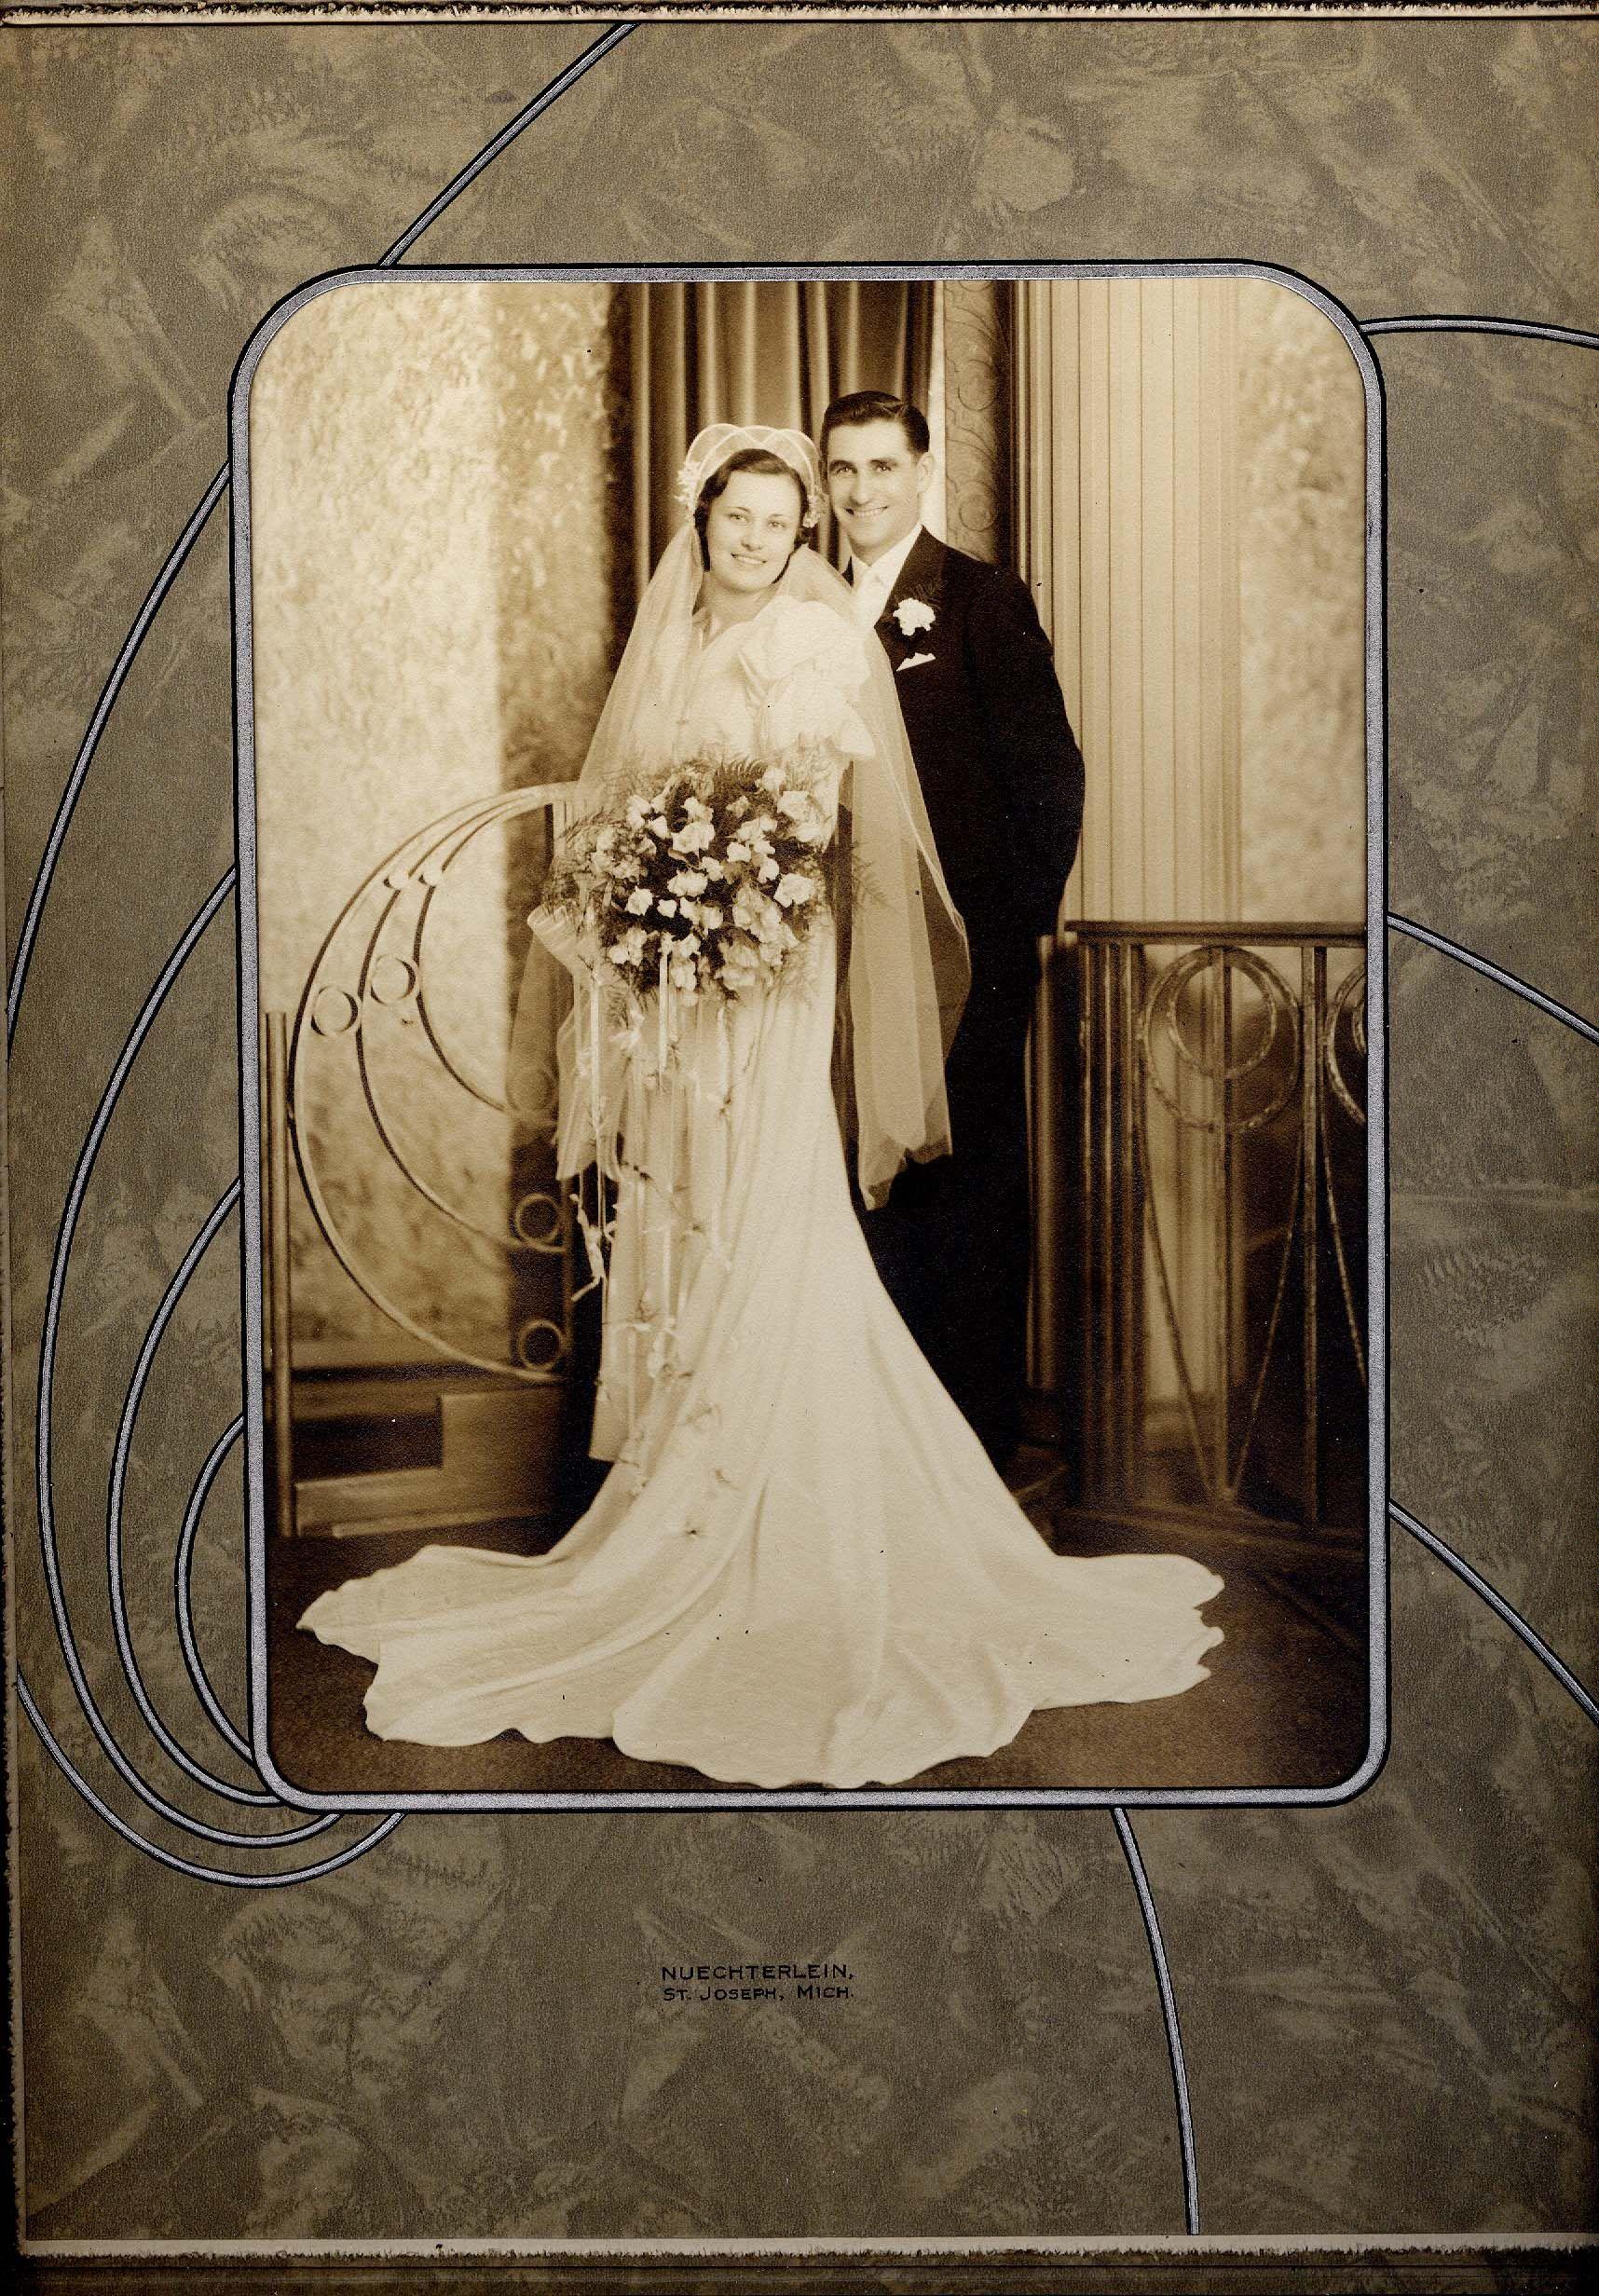 Vintage Photo Wedding NUECHTERLEIN St Joseph MI From A Yard Sale On